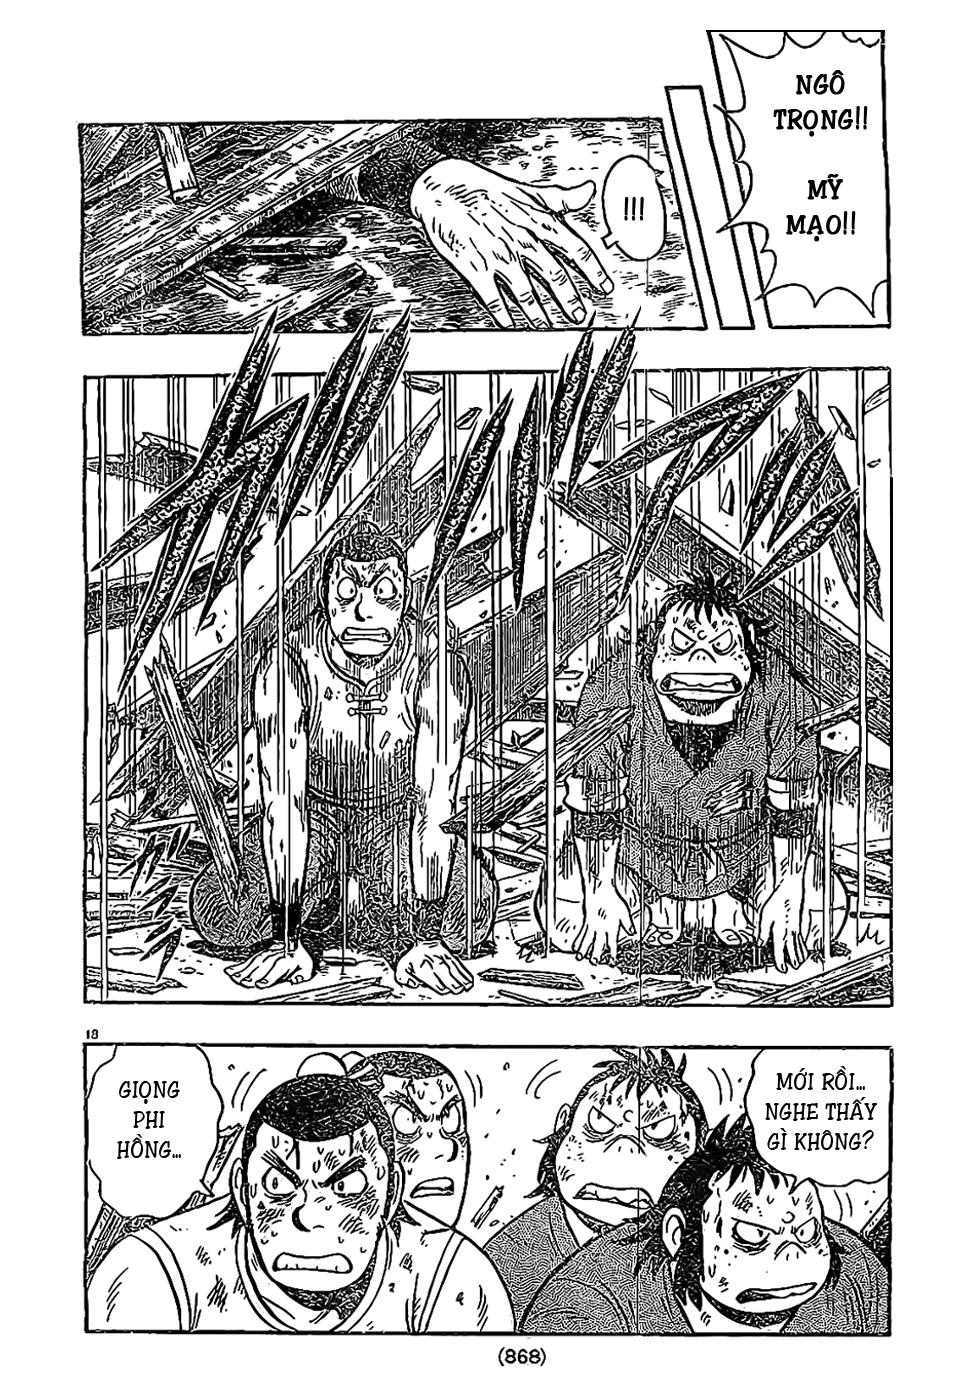 Hoàng Phi Hồng Phần 4 chap 85 Trang 19